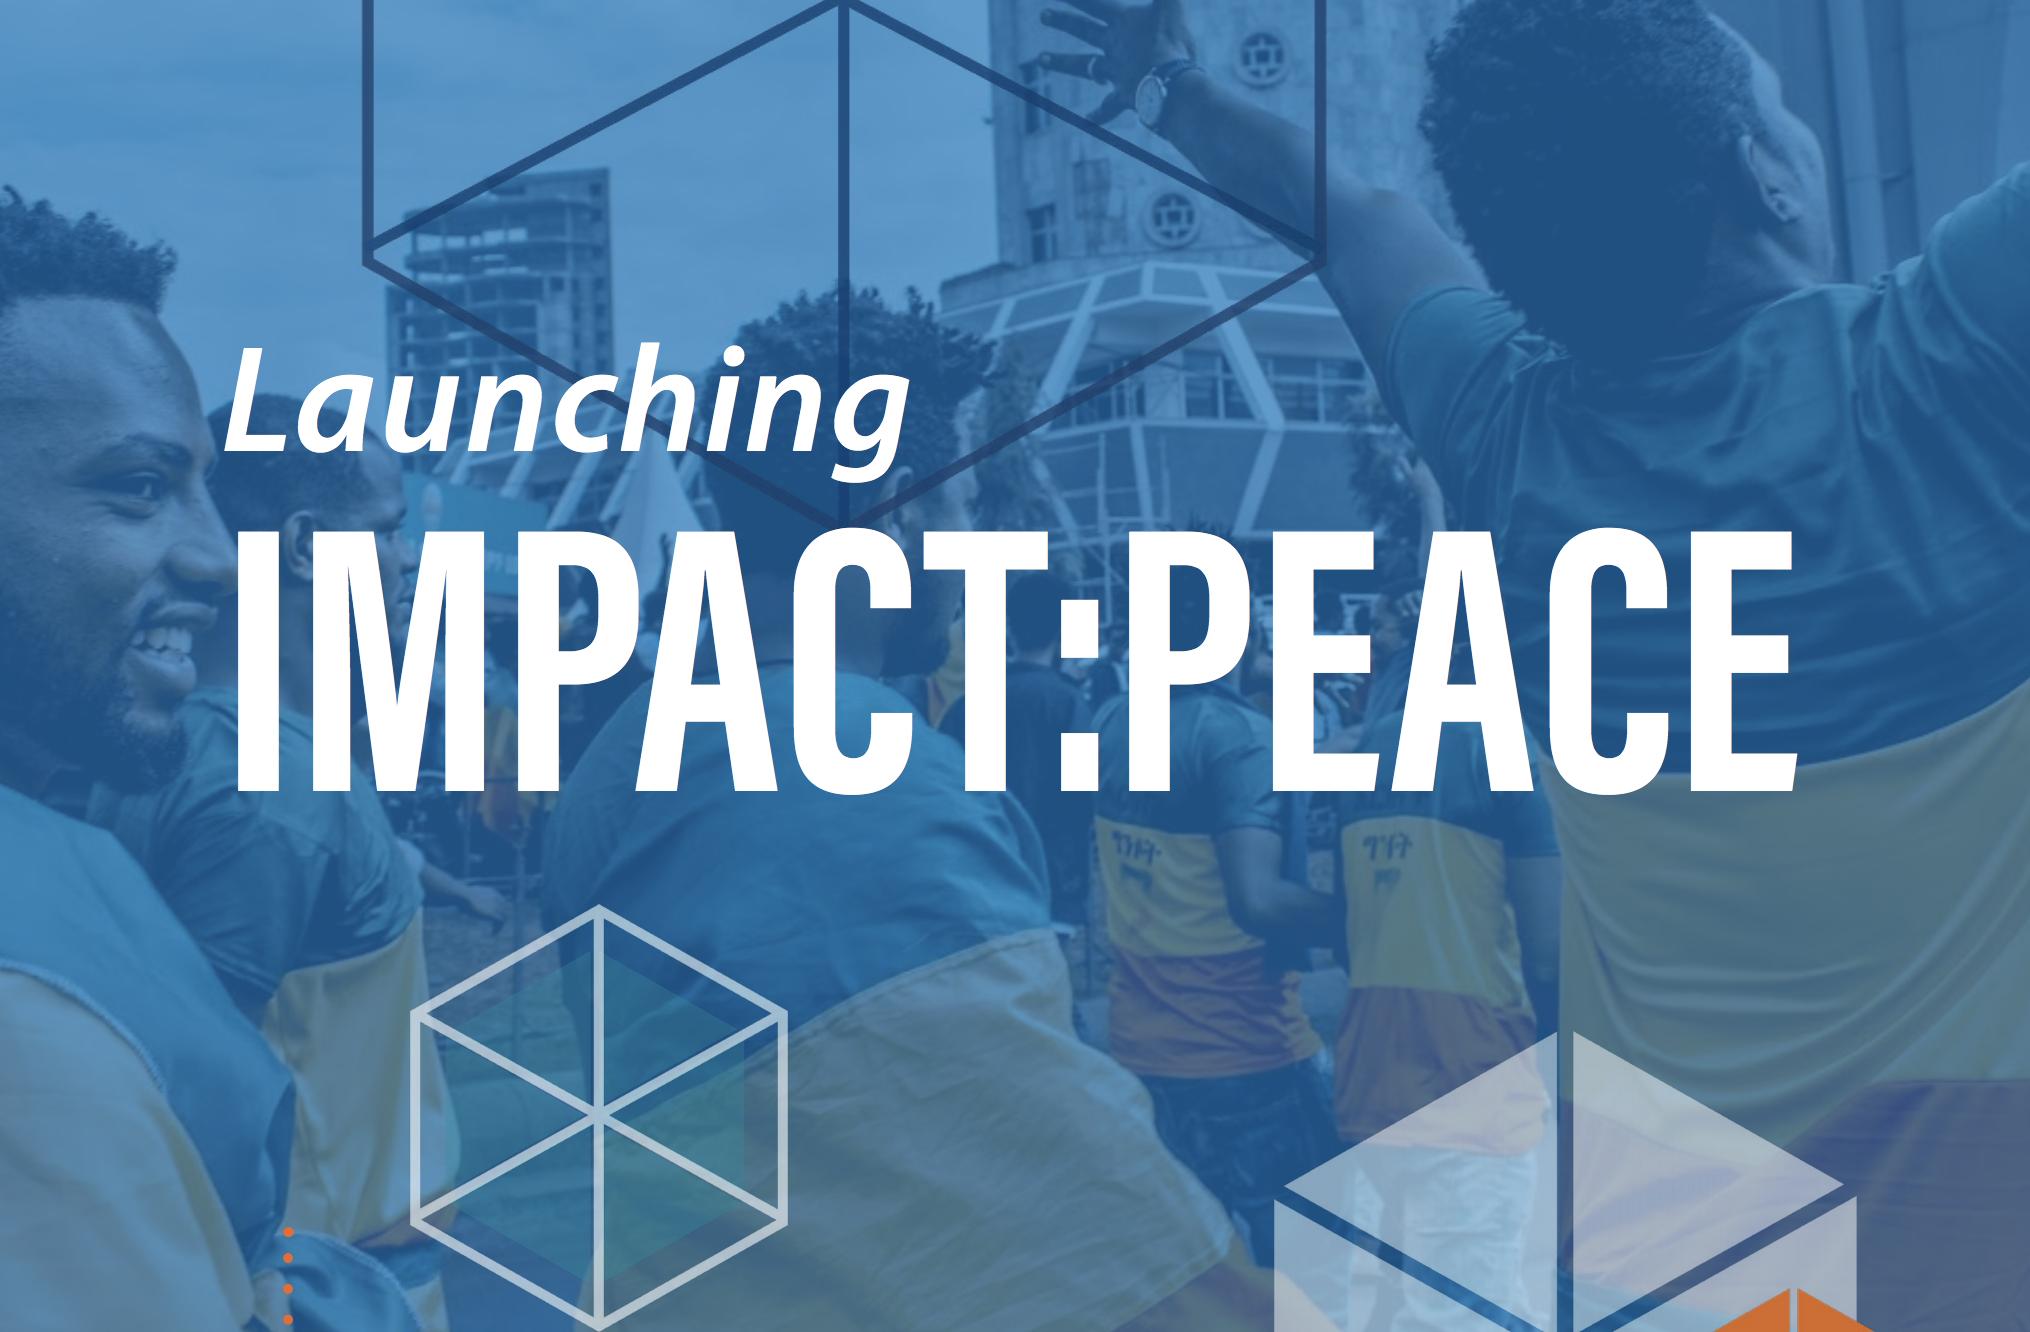 Launching Impact:Peace